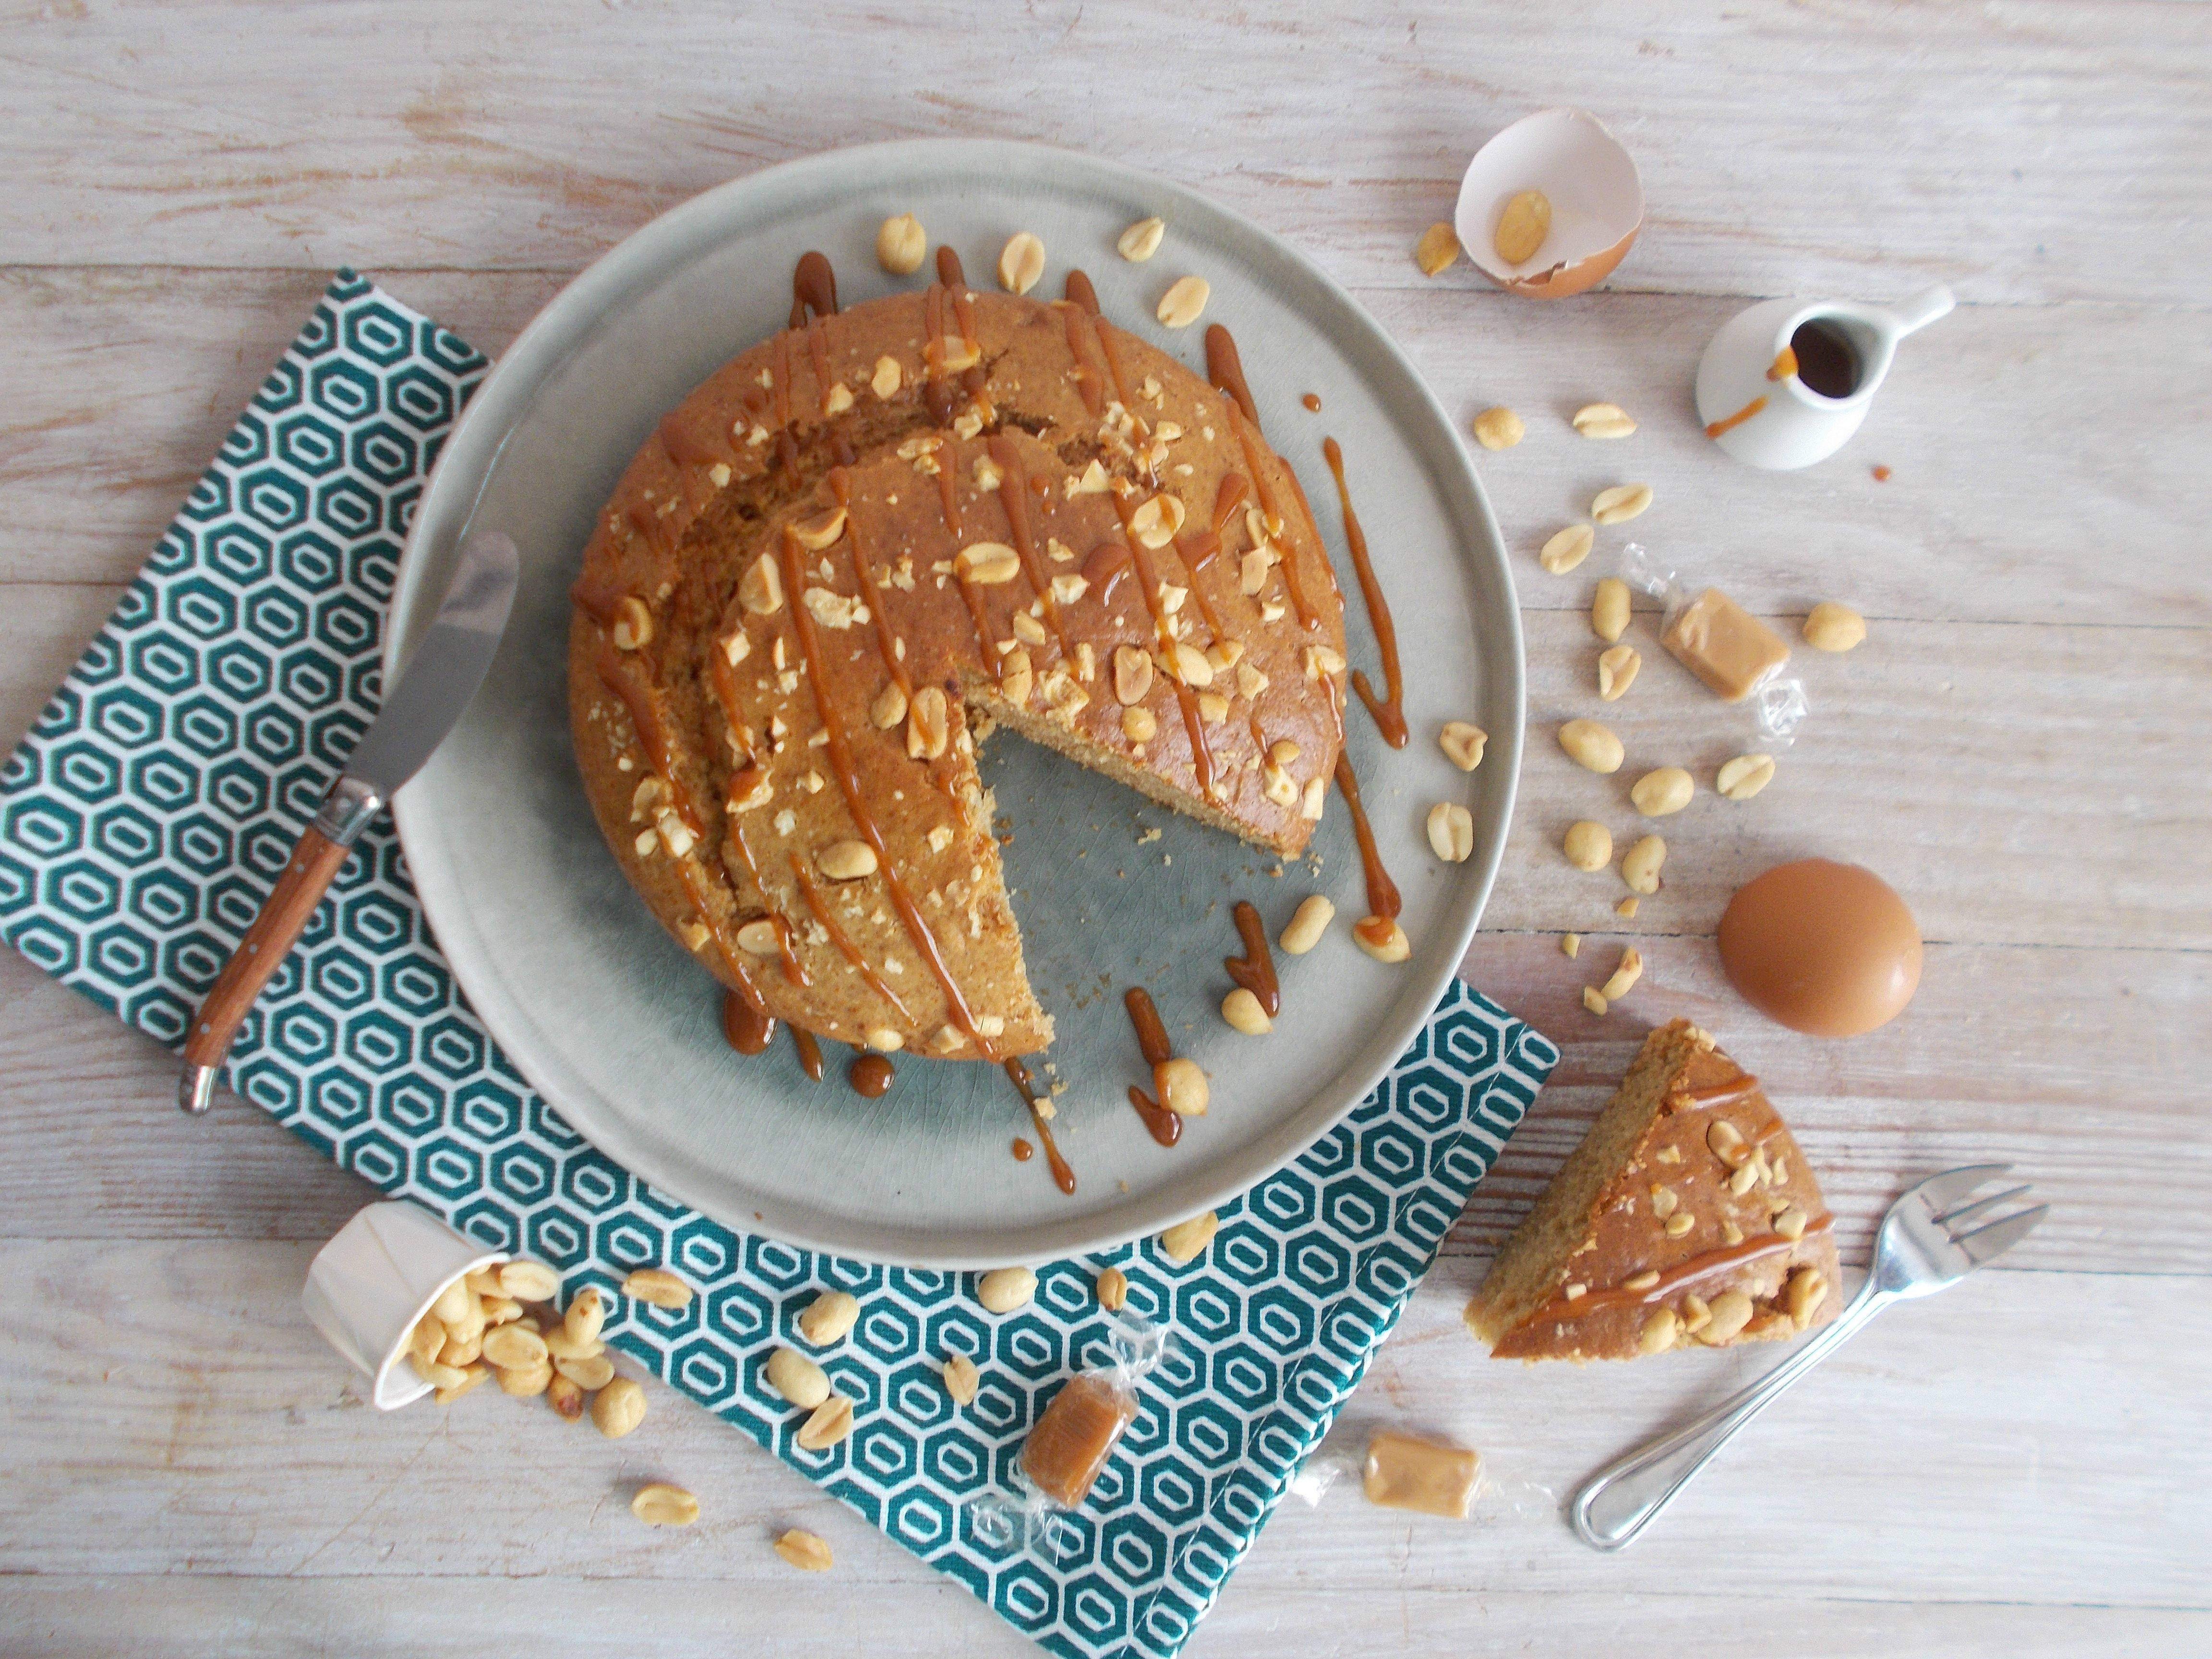 Gâteau cacahuète et caramel